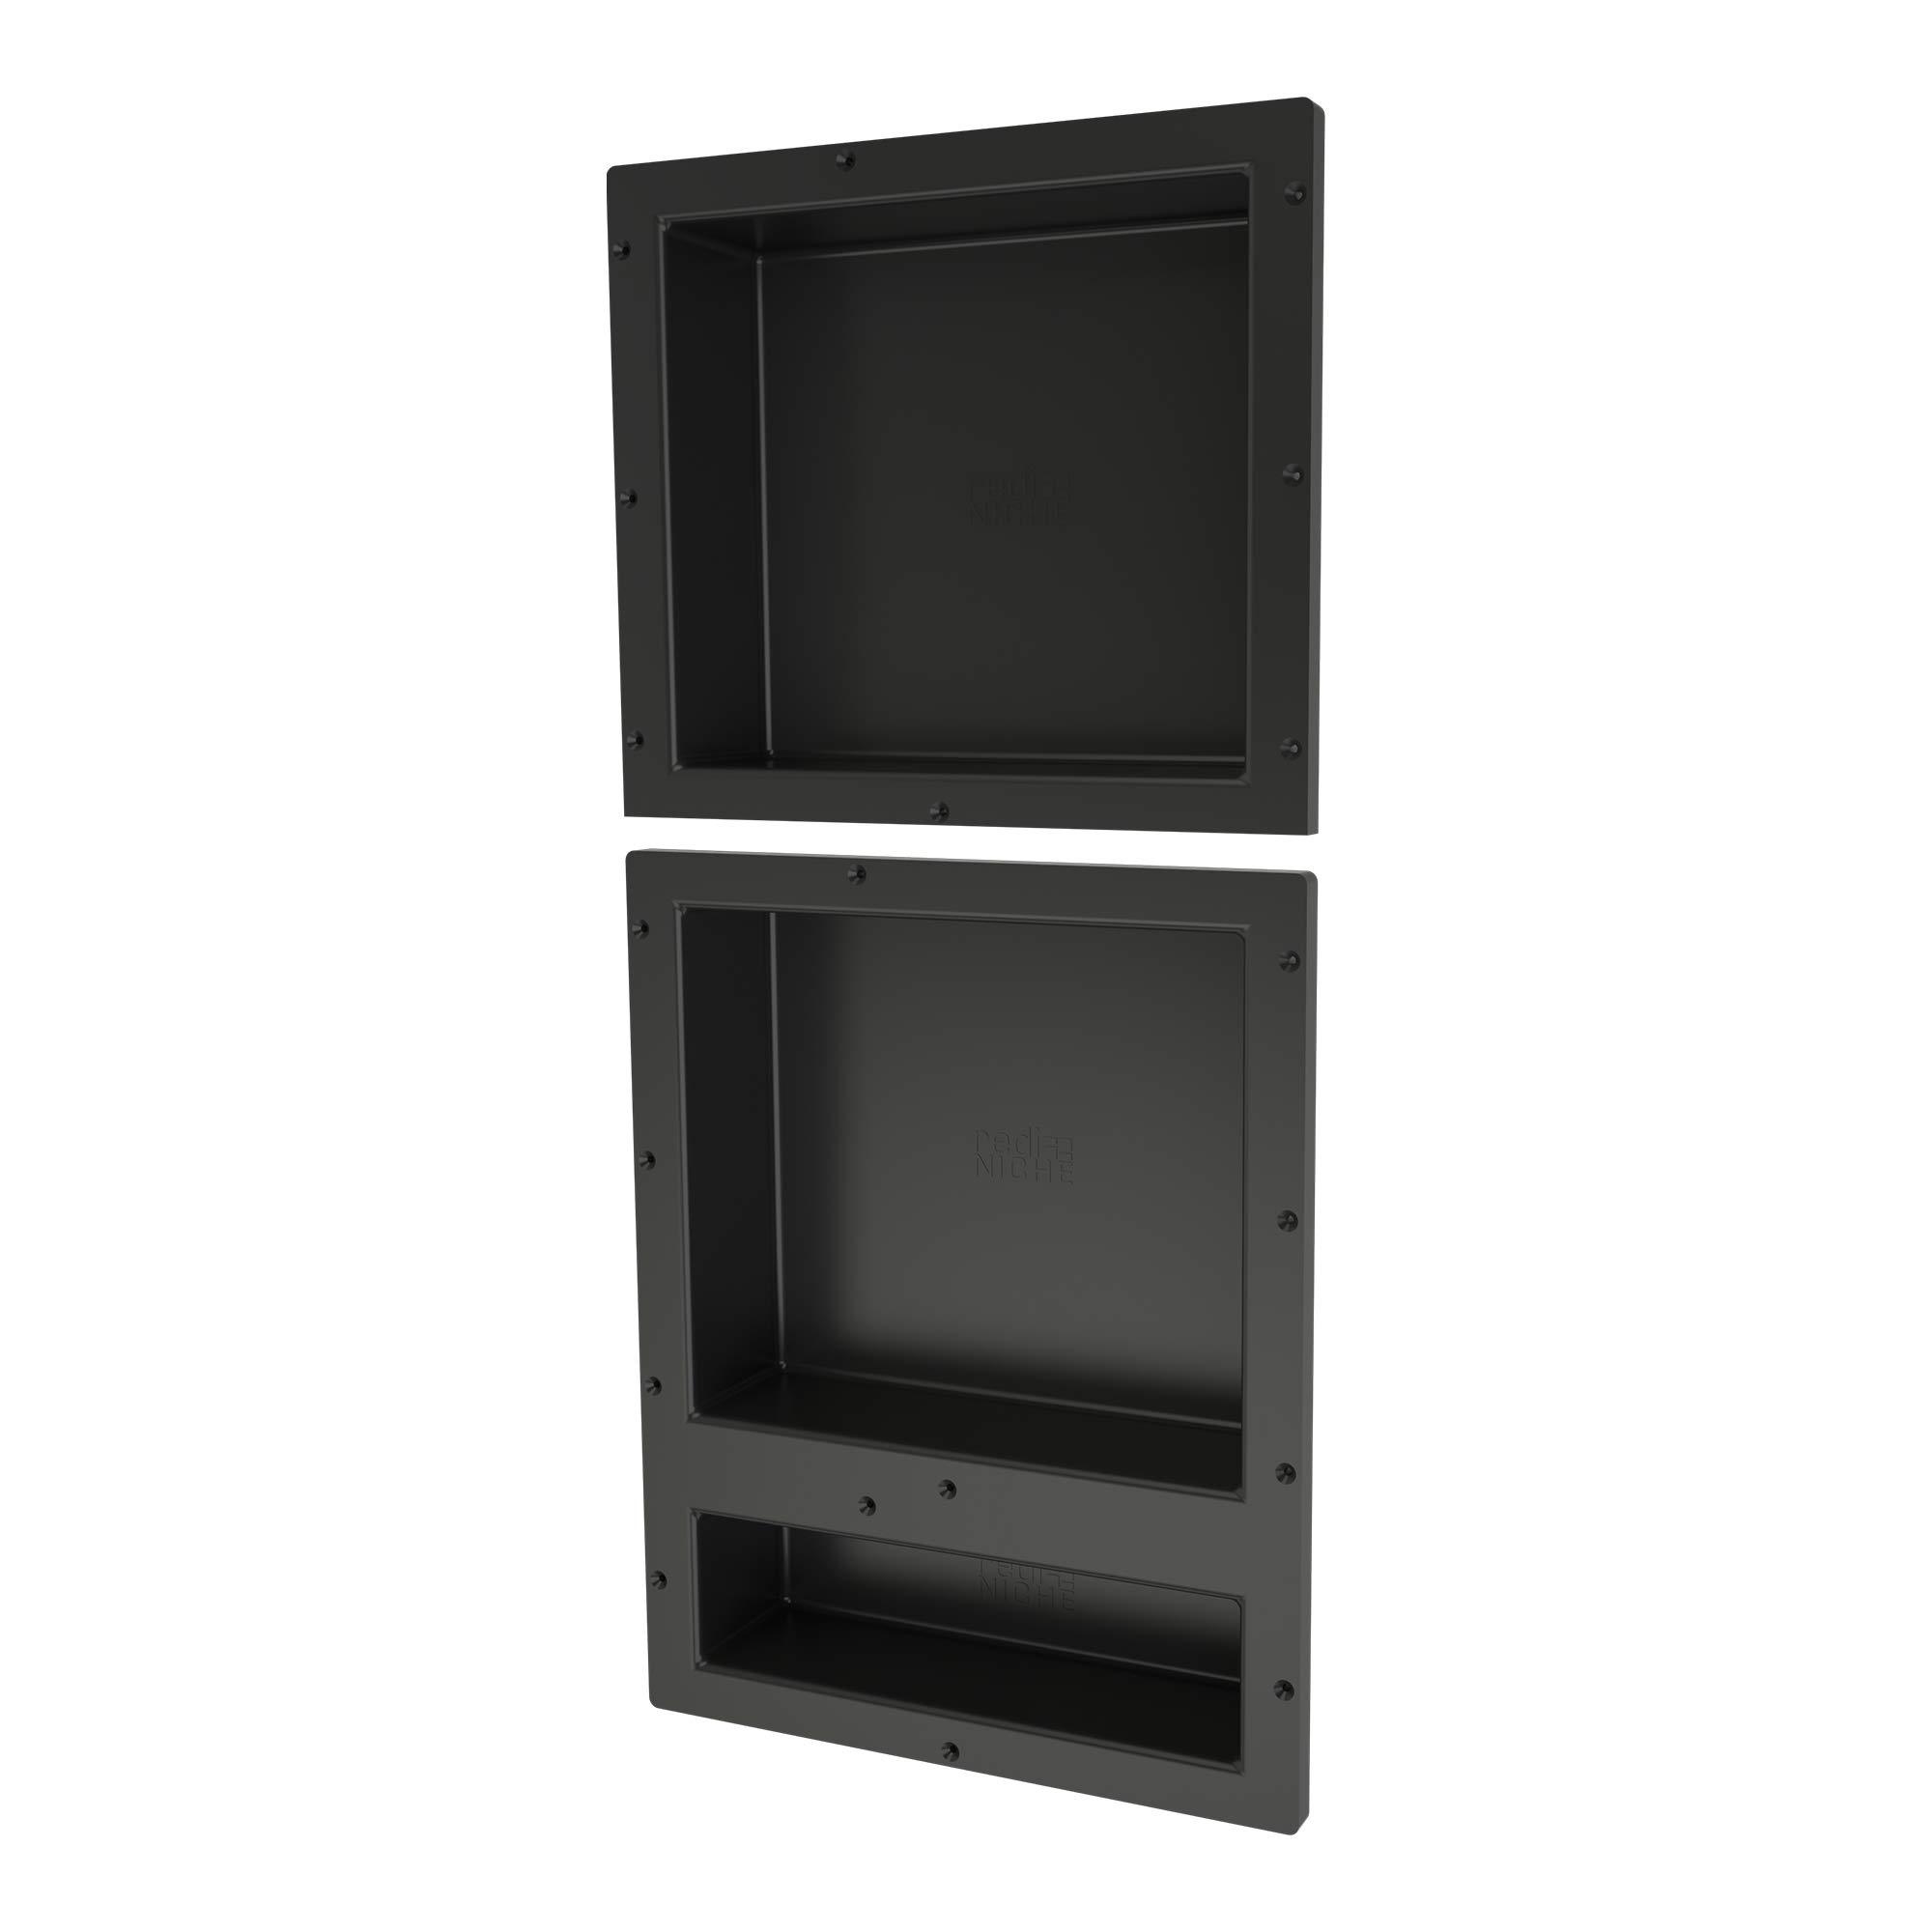 Tile Redi USA RNT1614S-20D Redi Niche Shower, 16'' W x 34'' H, Black